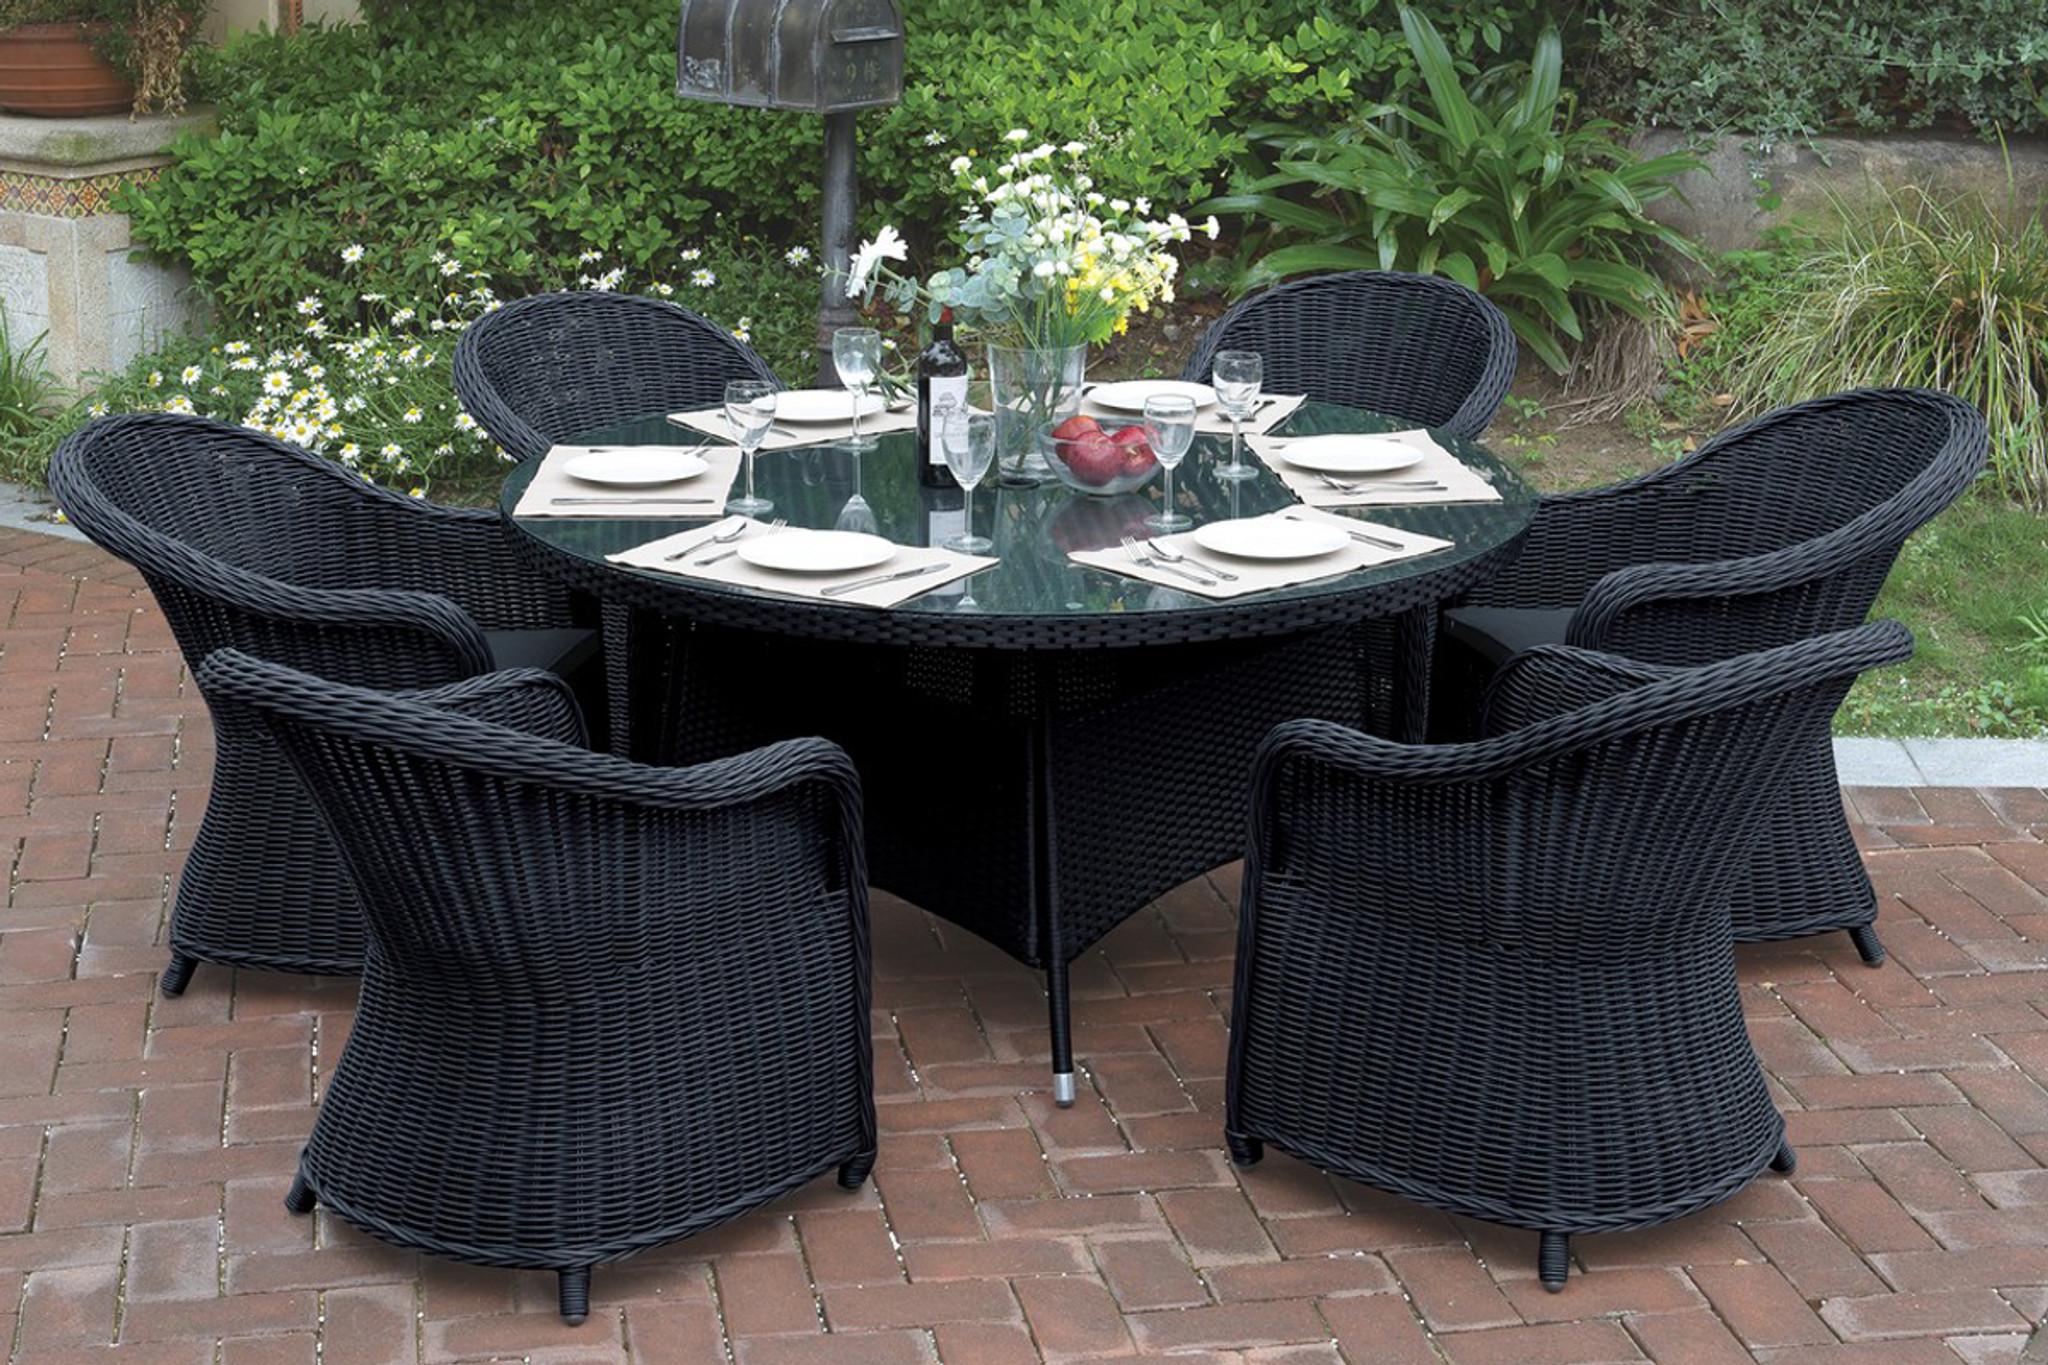 Stupendous 7Pcs Cottage Style Outdoor Patio Table Set Interior Design Ideas Grebswwsoteloinfo